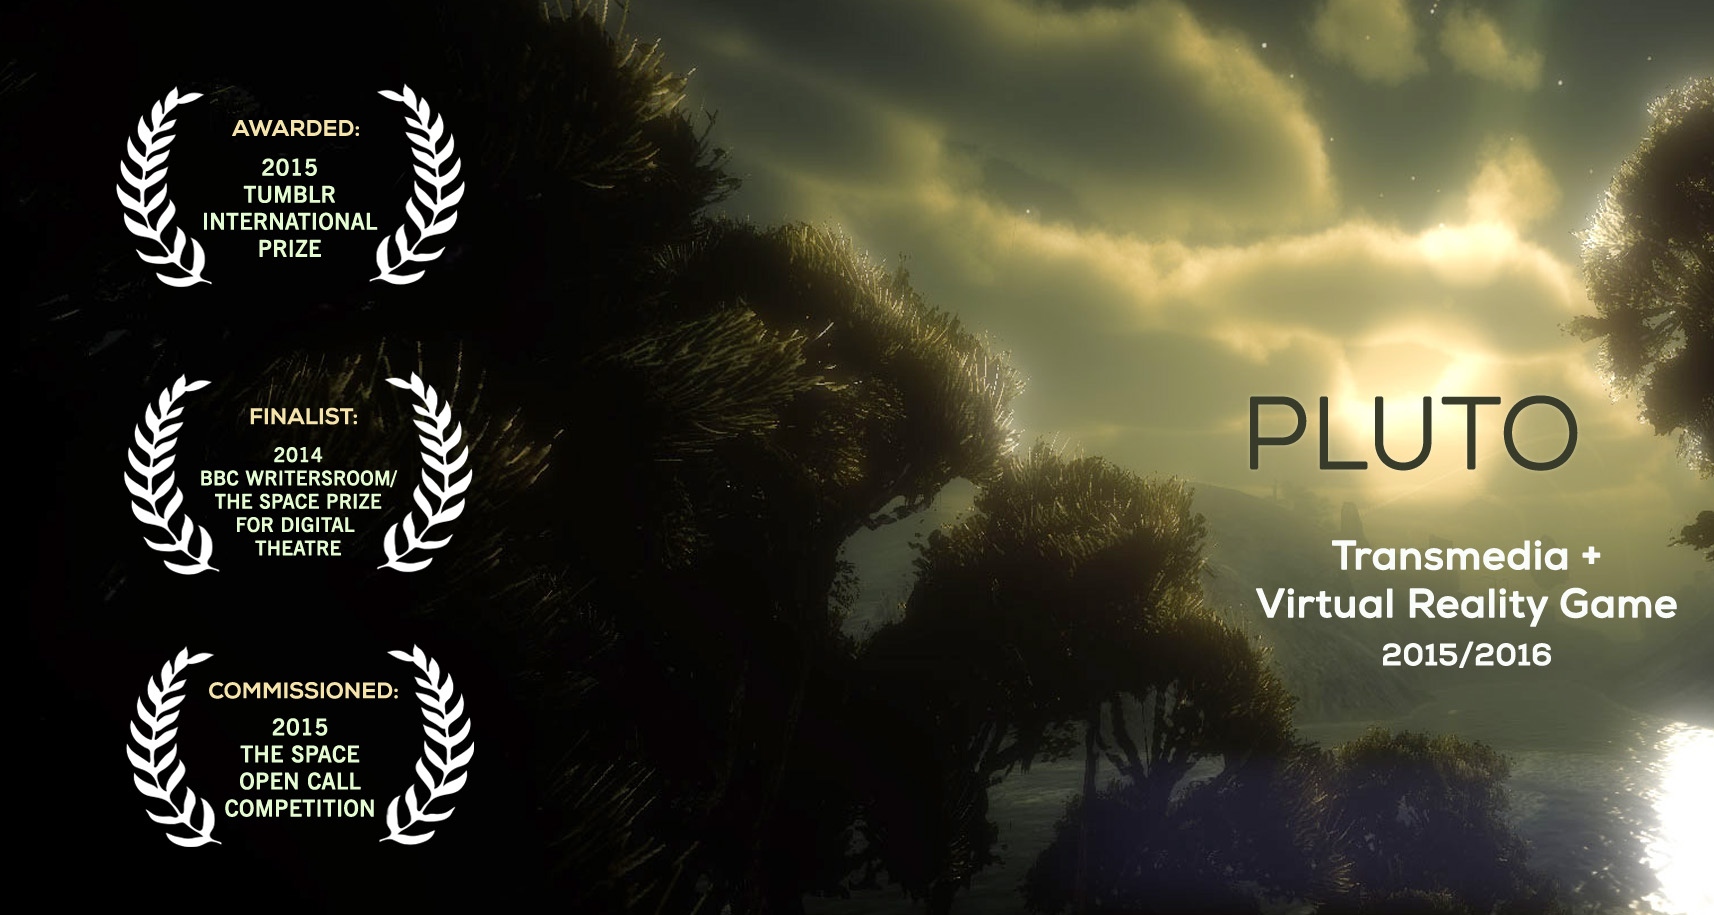 Pluto: Transmedia/VR